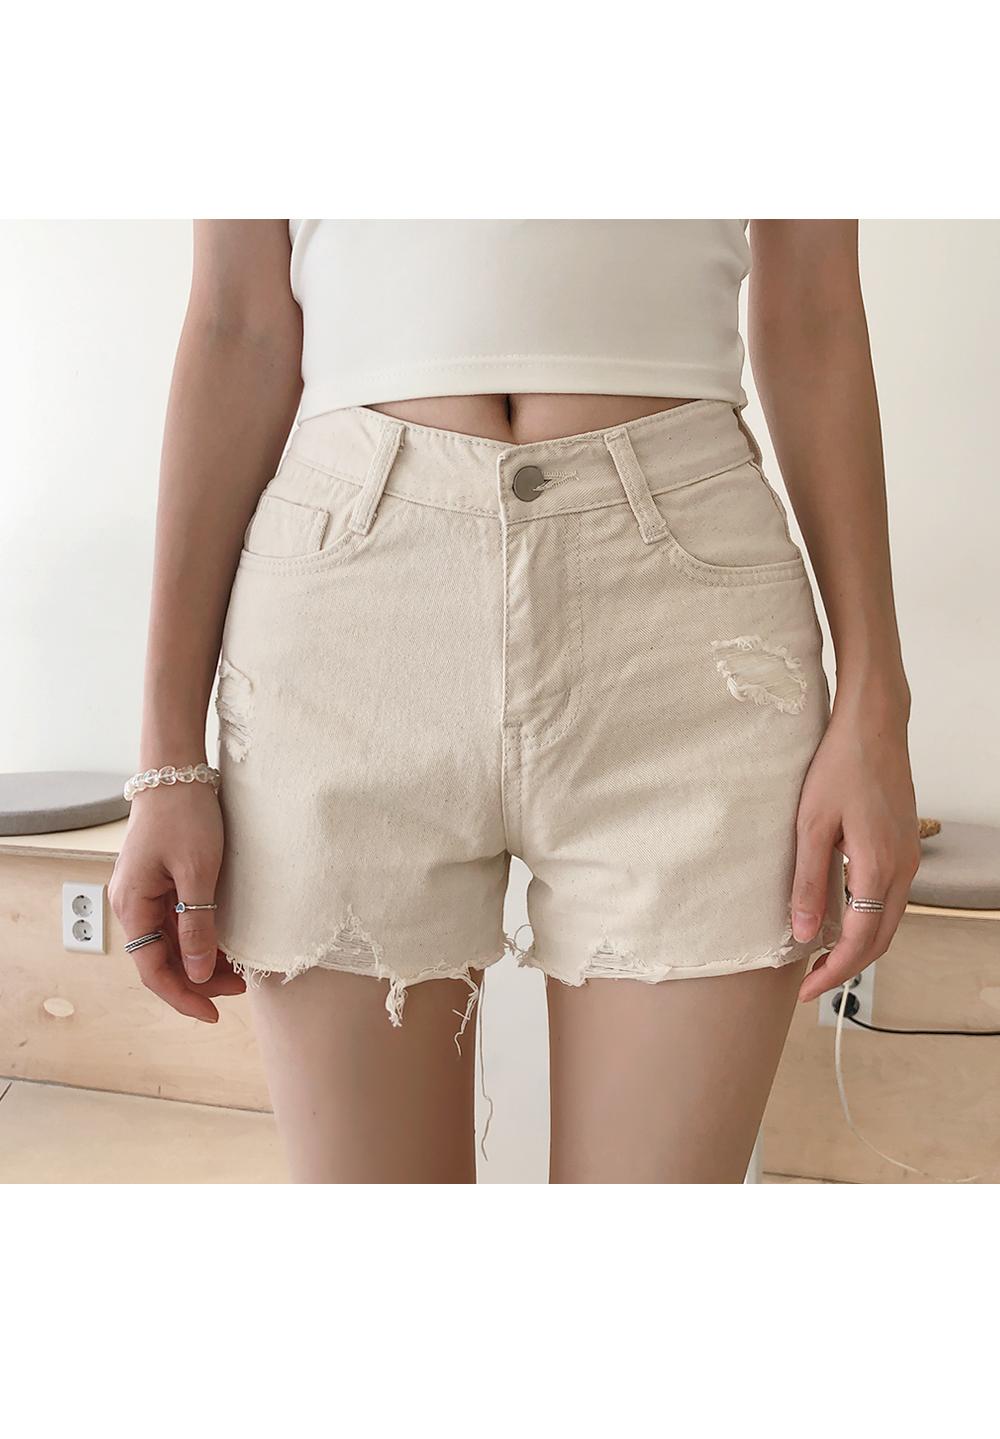 Cut beige pants